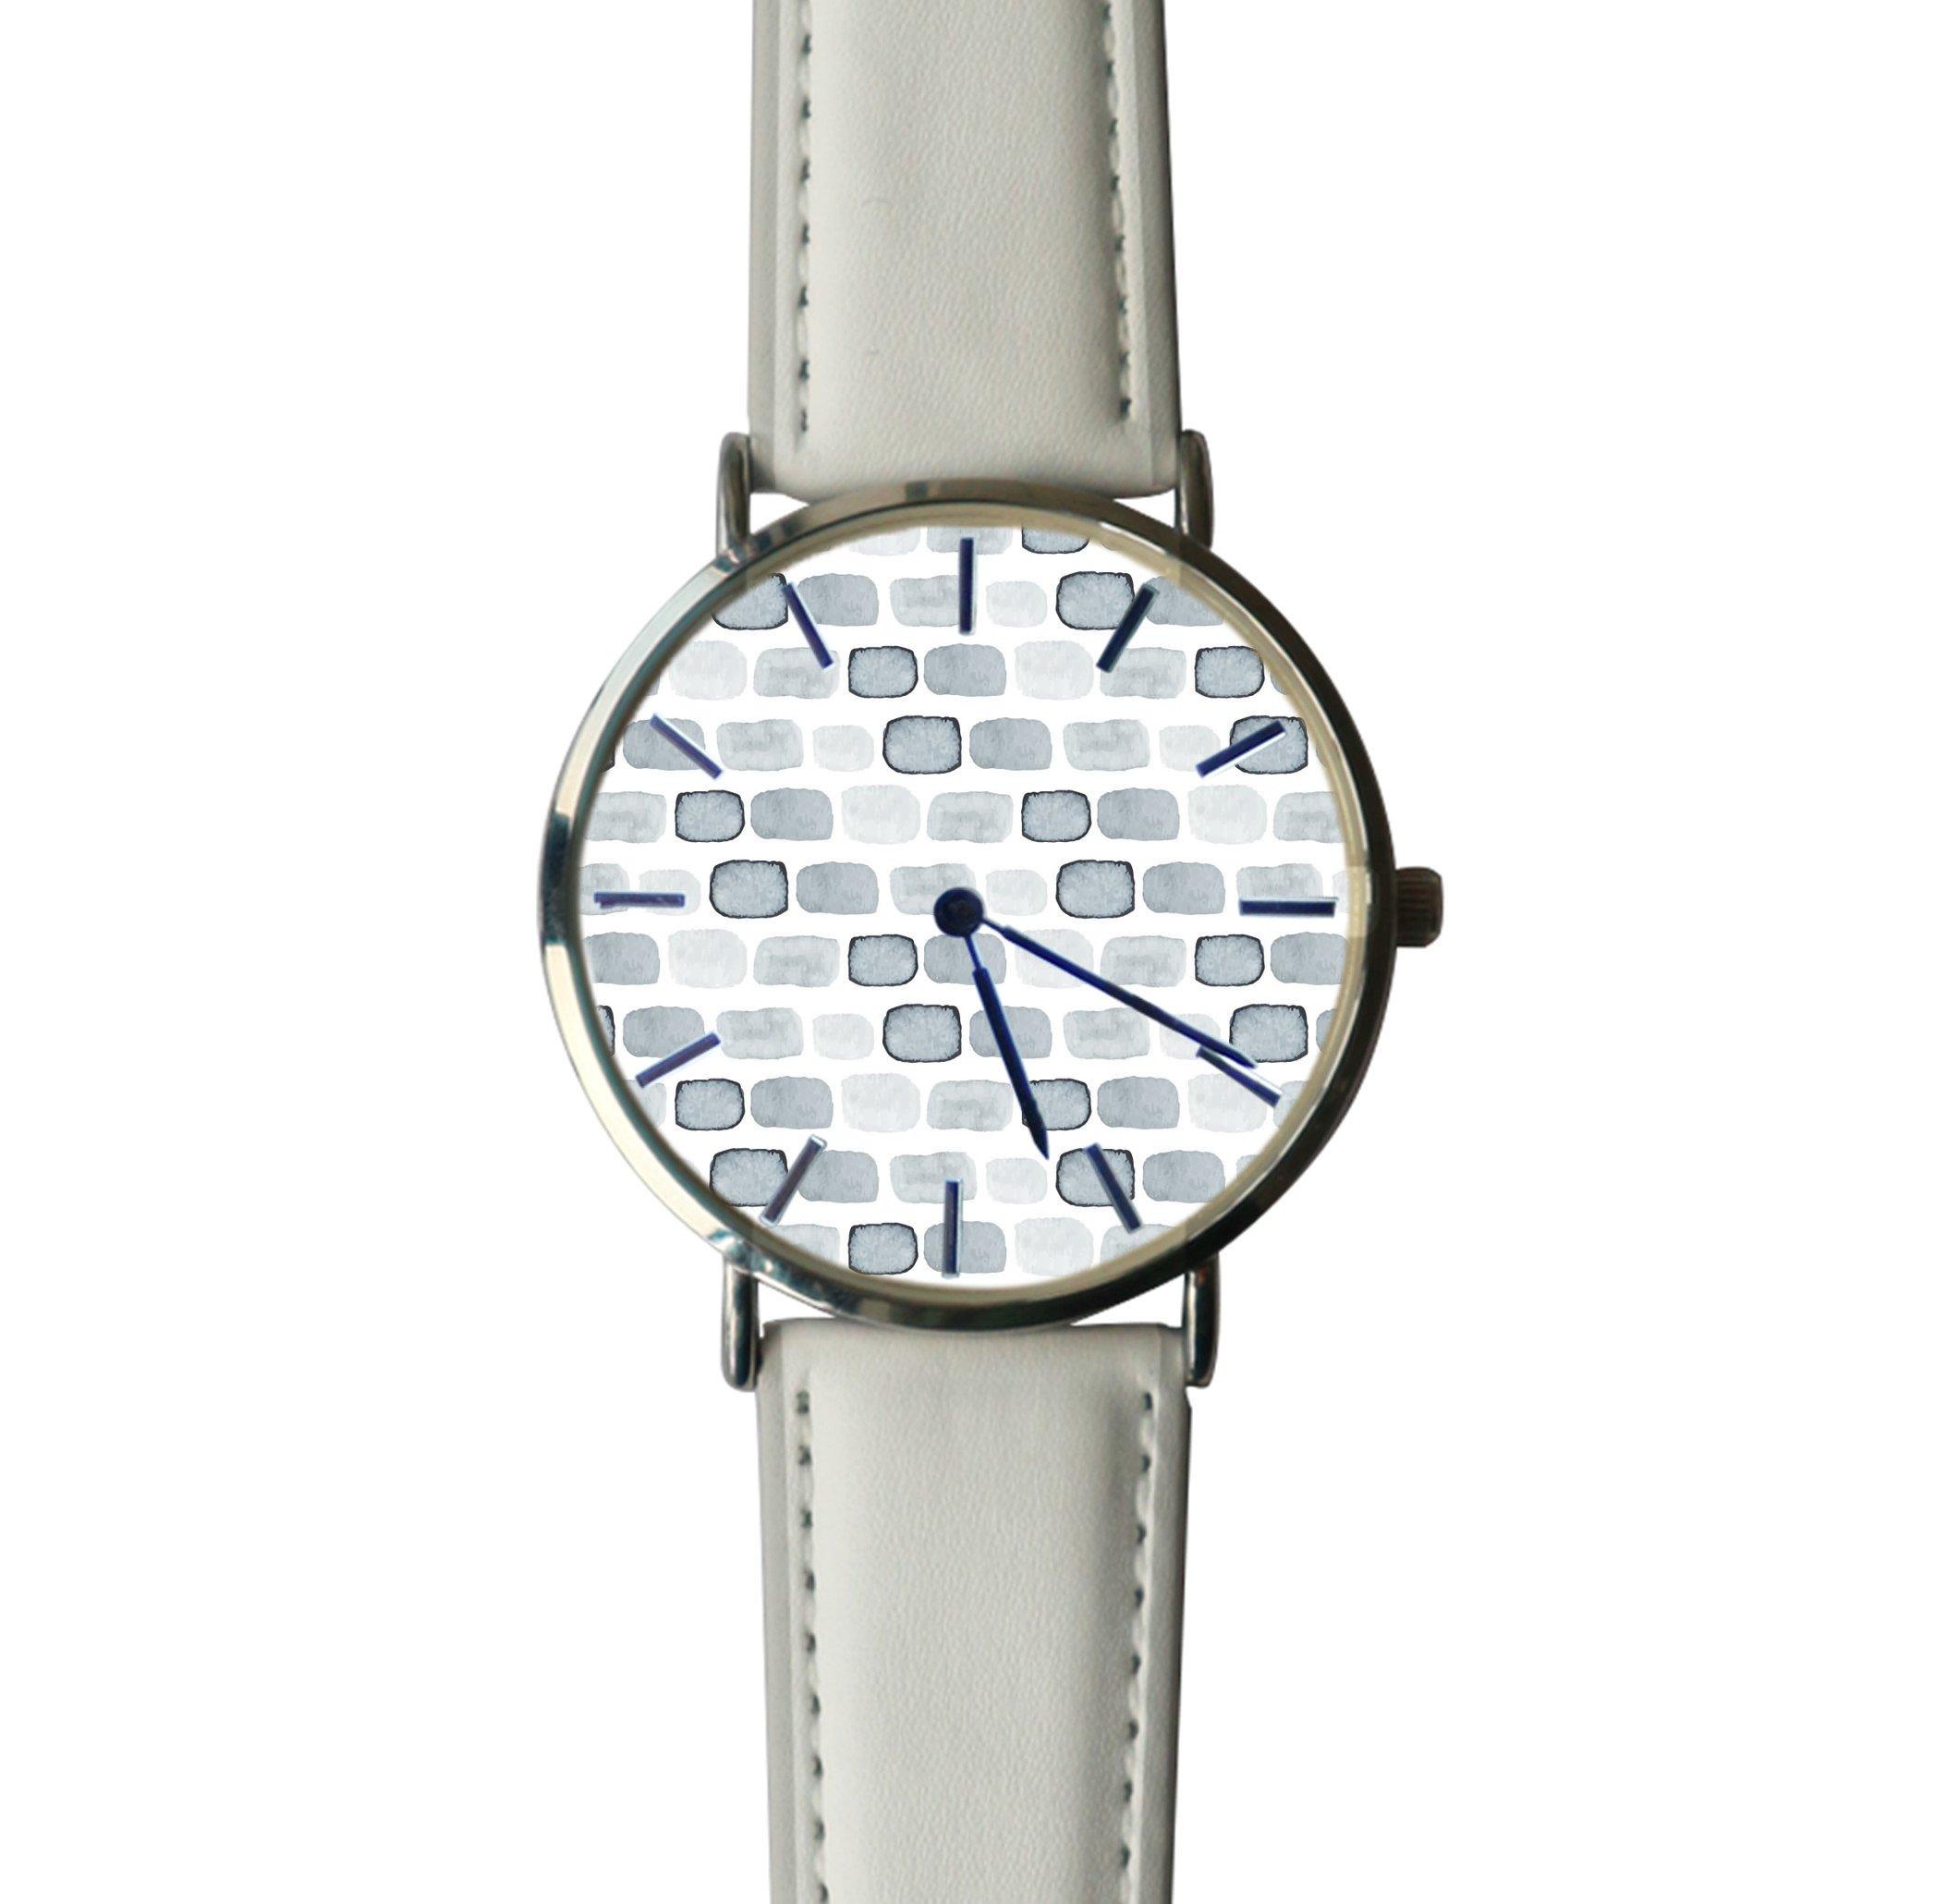 JISJJCKJSX Gray Geometric custom watches quartz watch stainless steel case